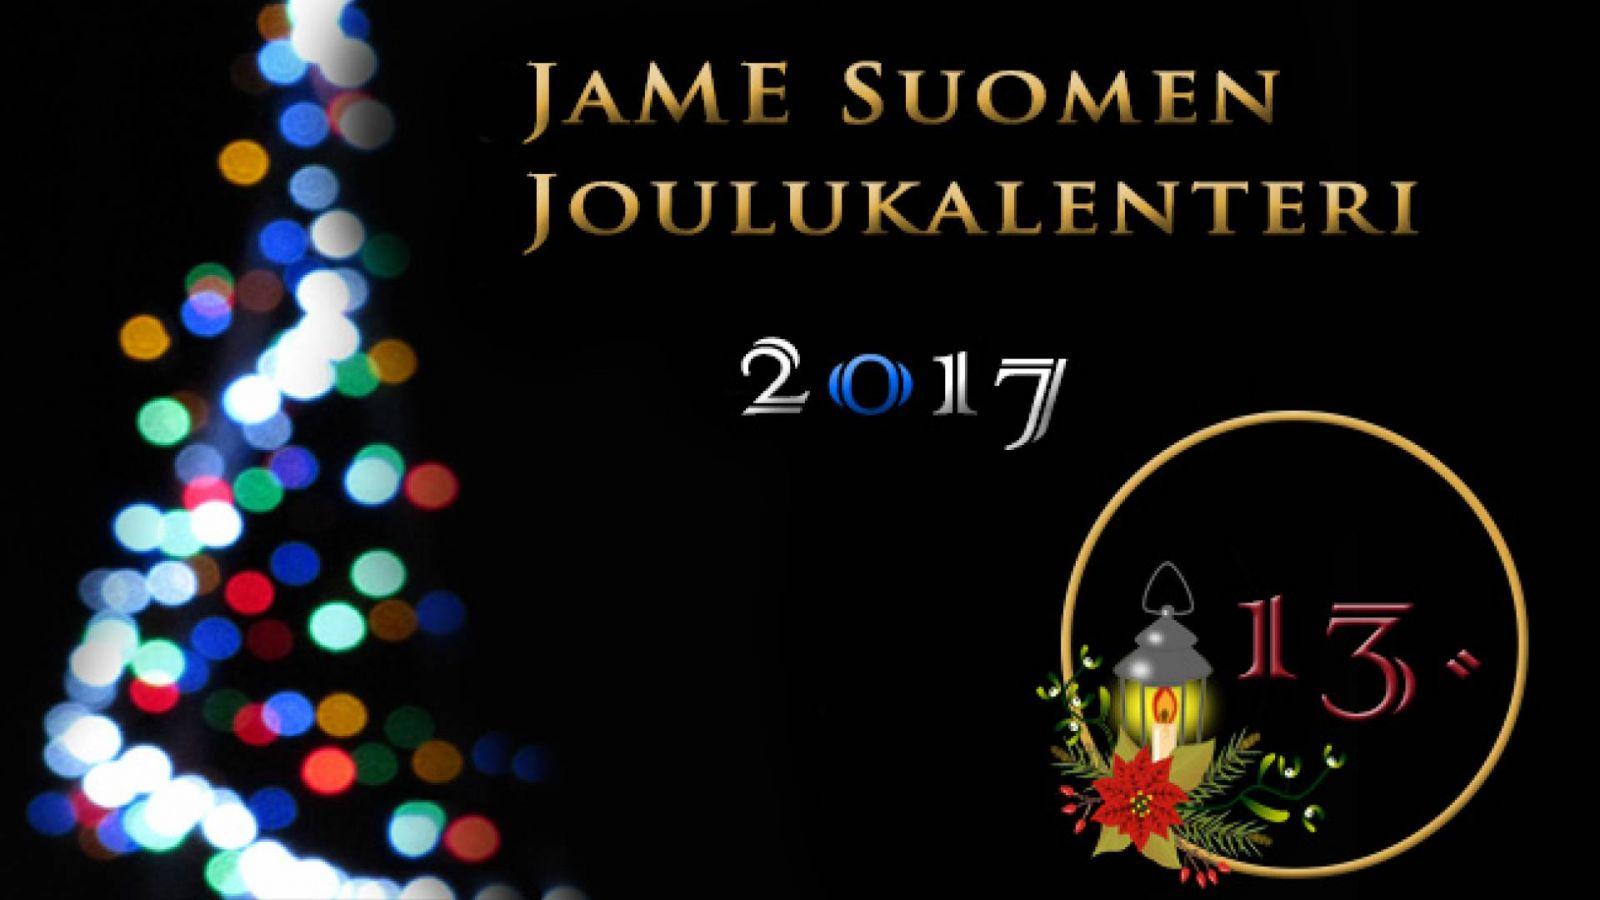 JaME Suomen joulukalenterin 13. luukku © Nipsu